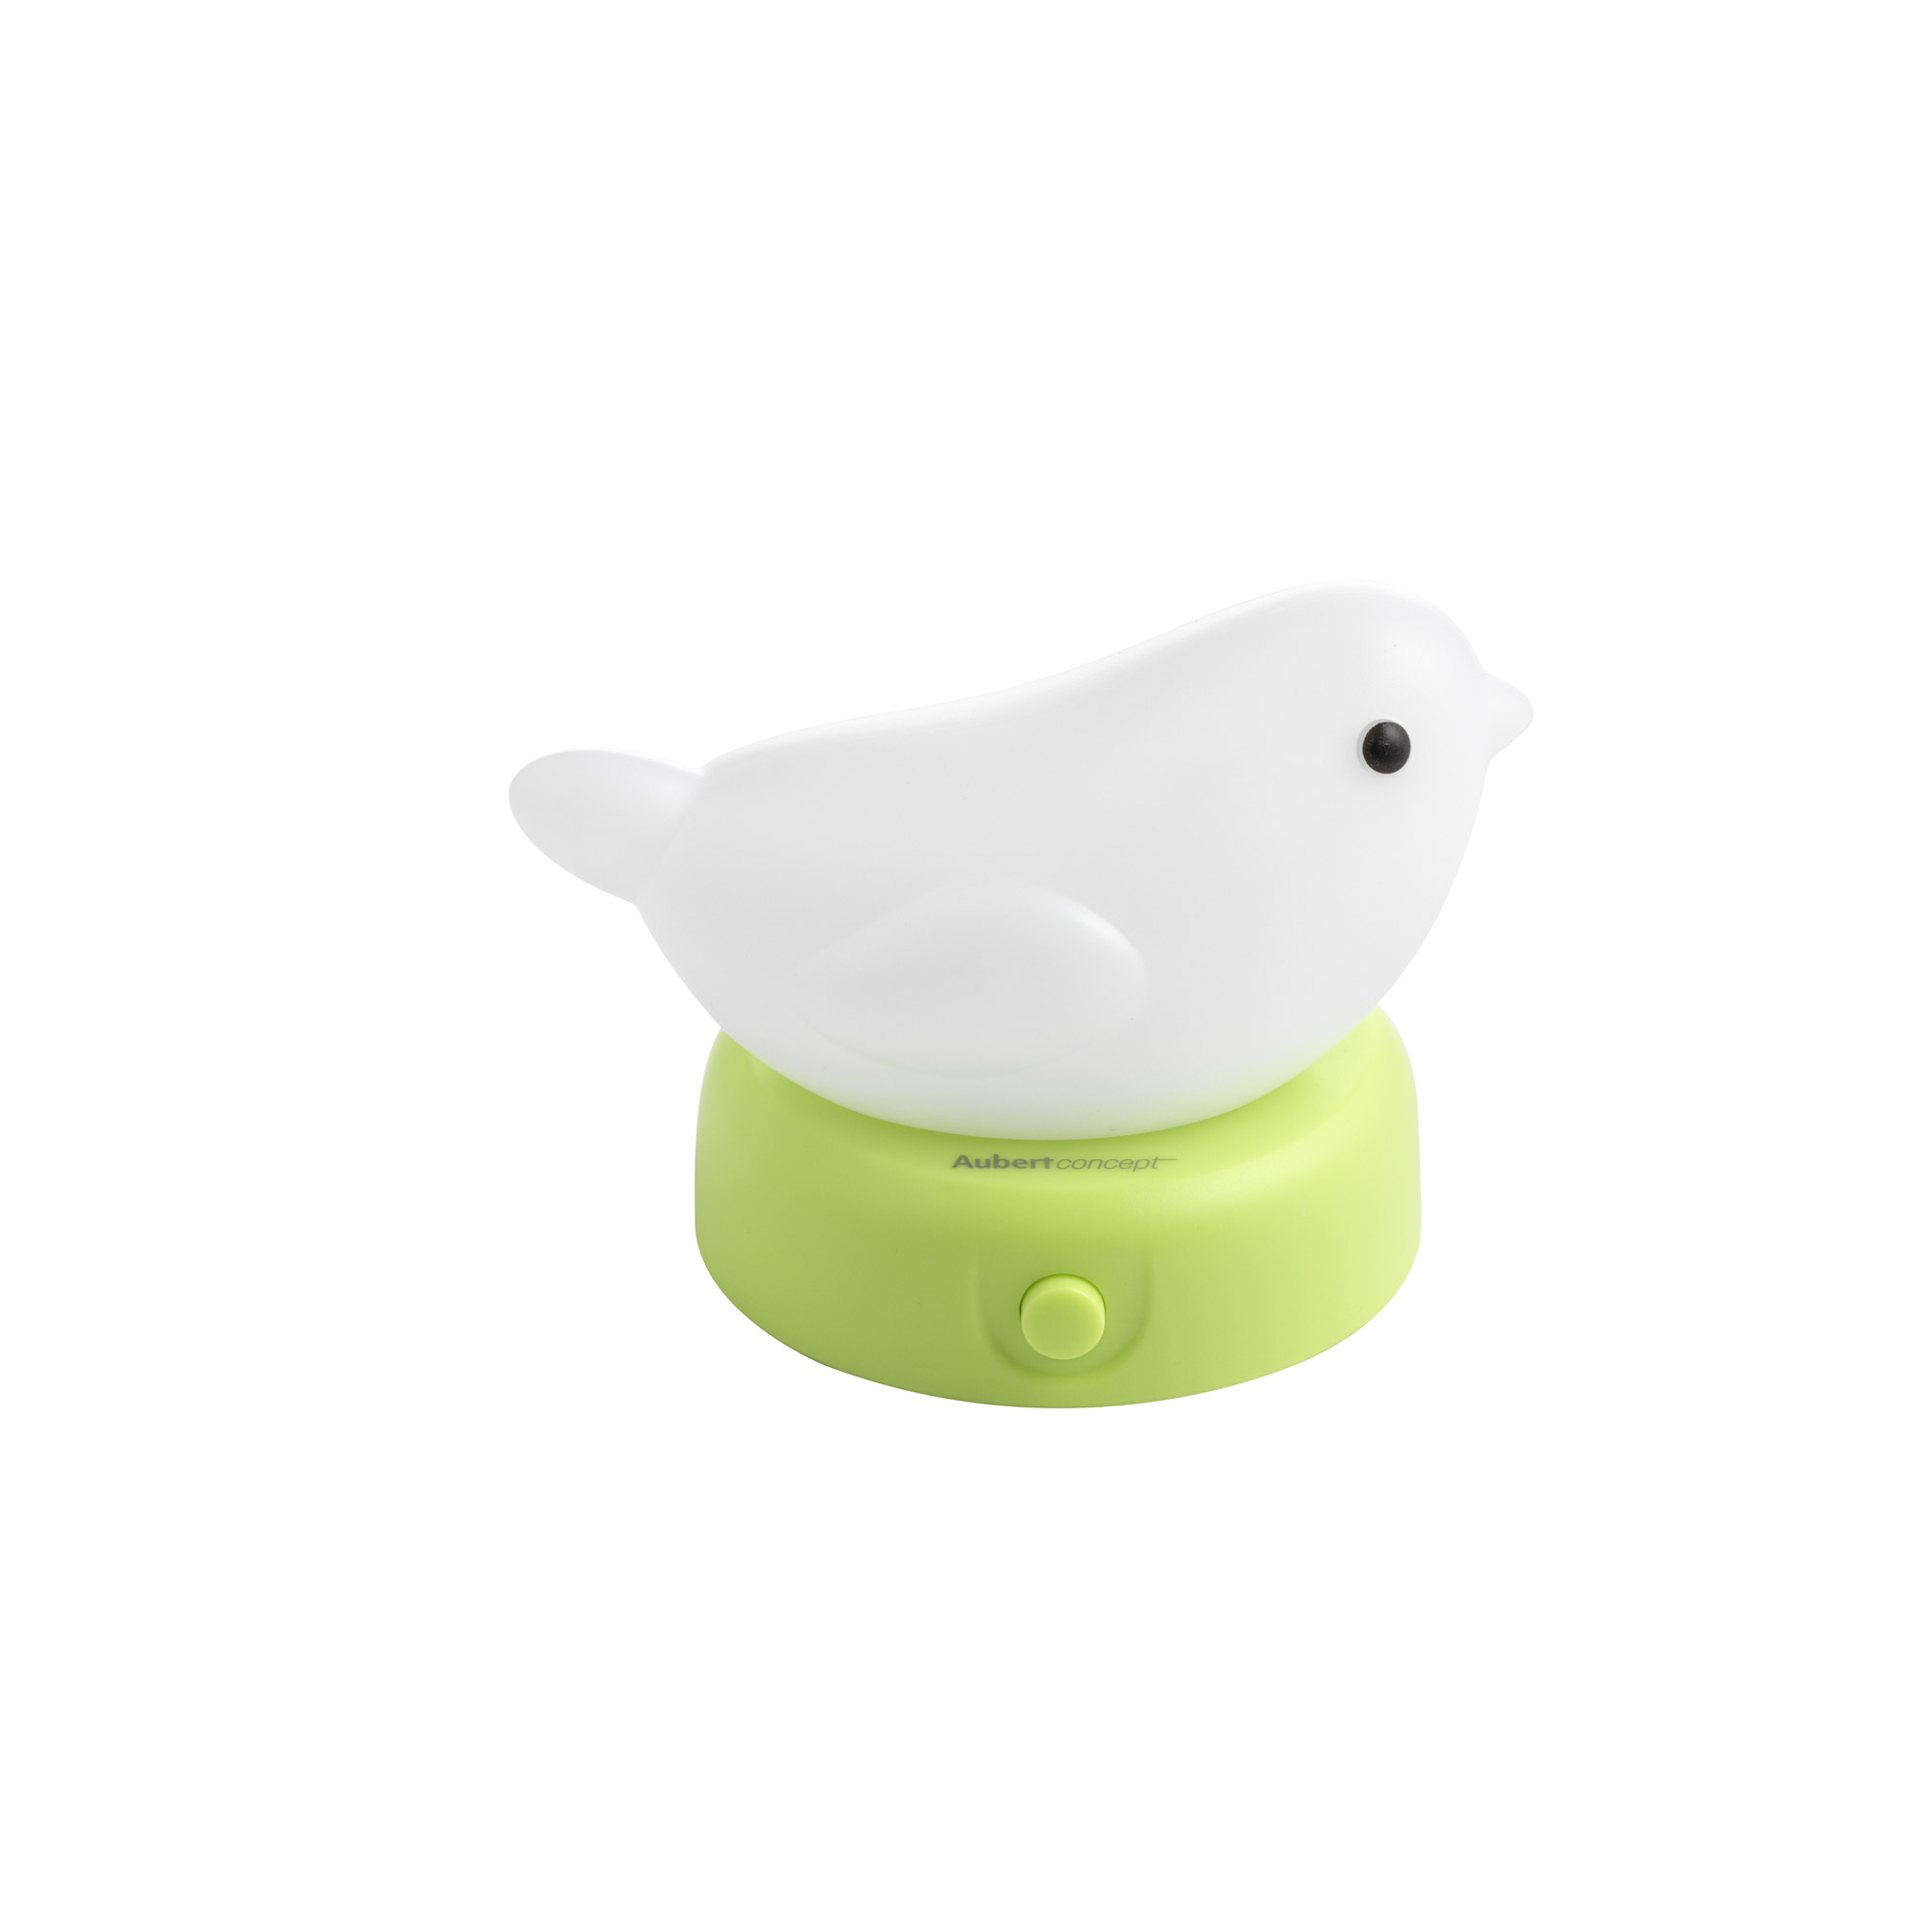 Veilleuse oiseau Blanc  de Aubert concept